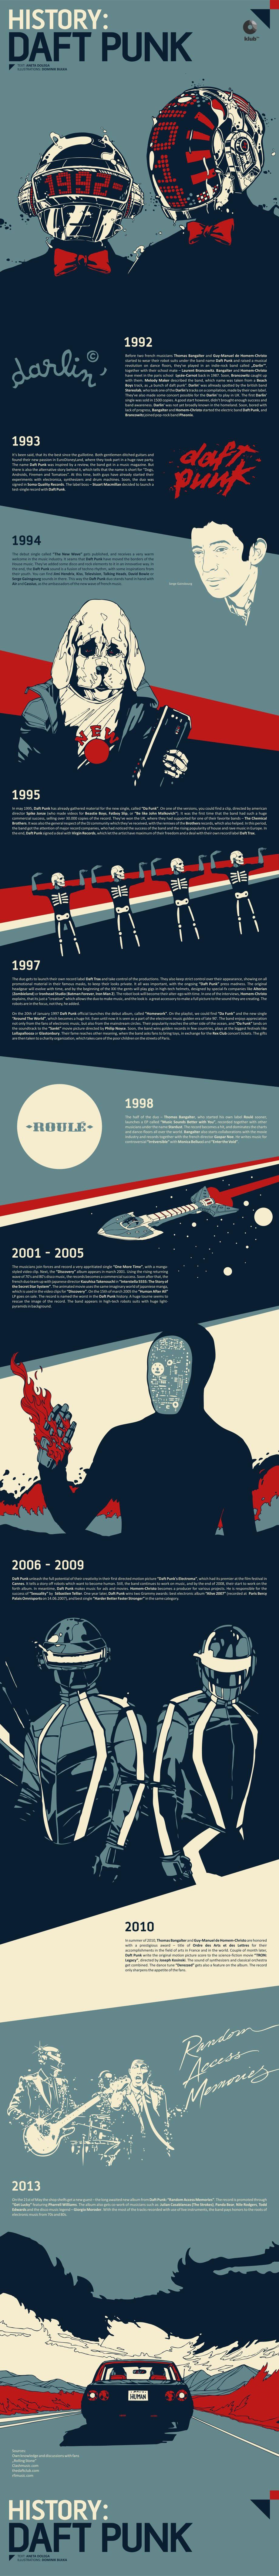 Daft Punk History